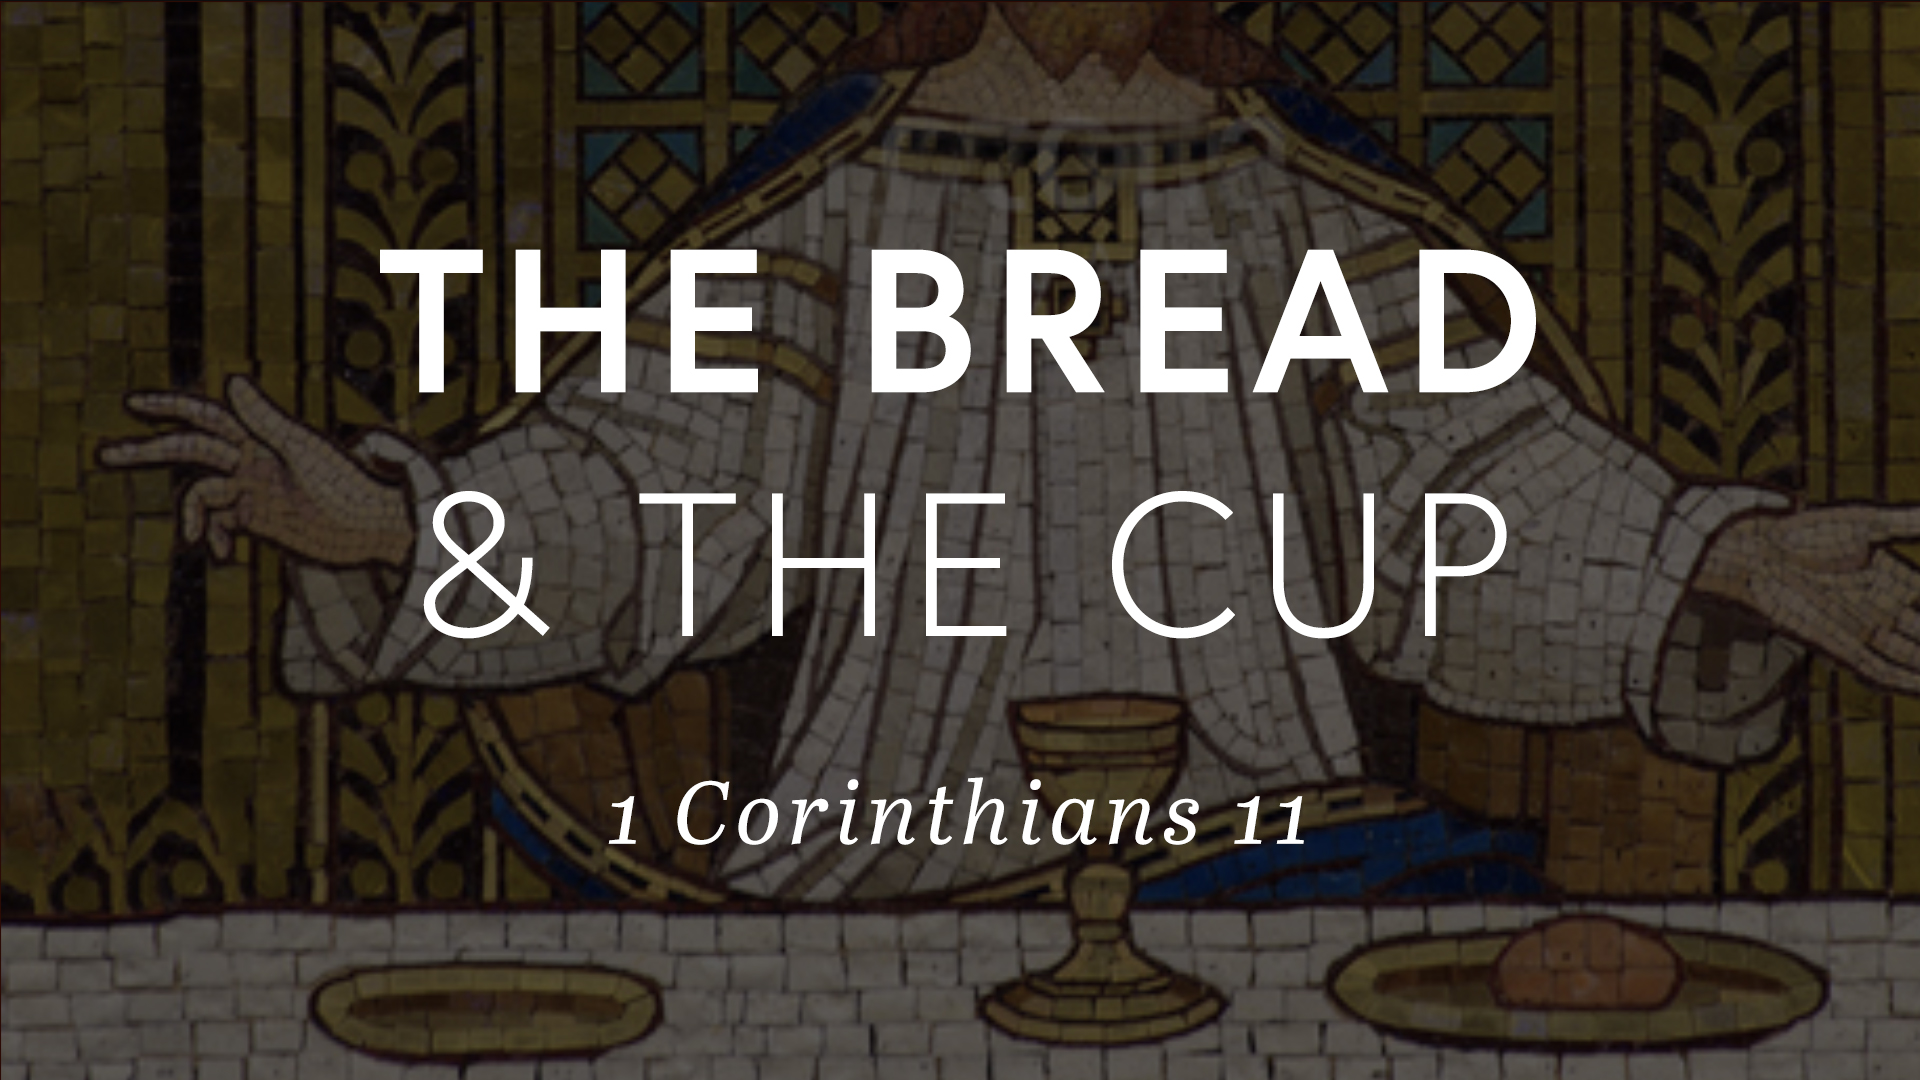 BreadCupTitle.jpg